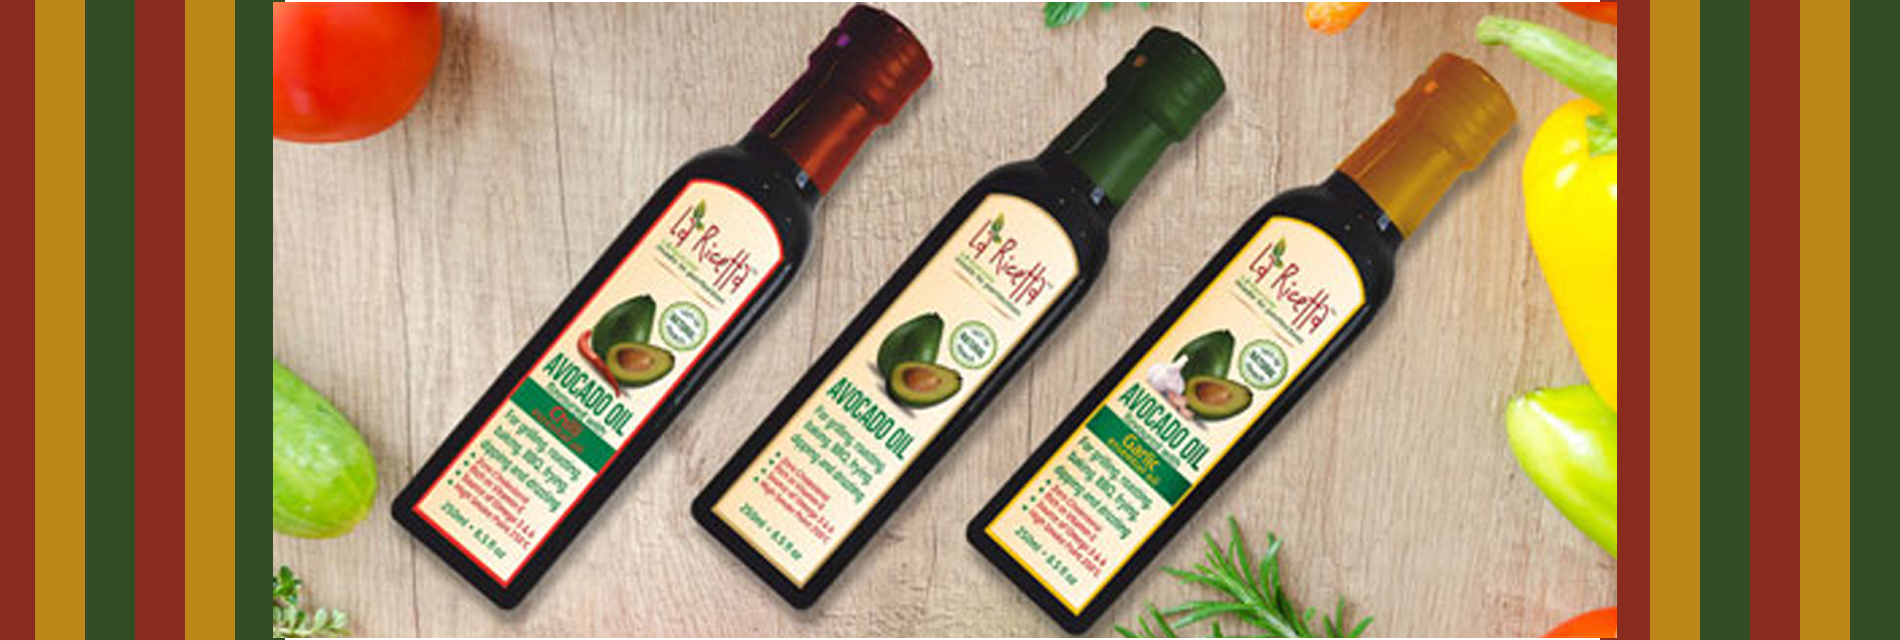 http://www.enaturalltd.com/products/la-ricetta-premium-avocado-oils/